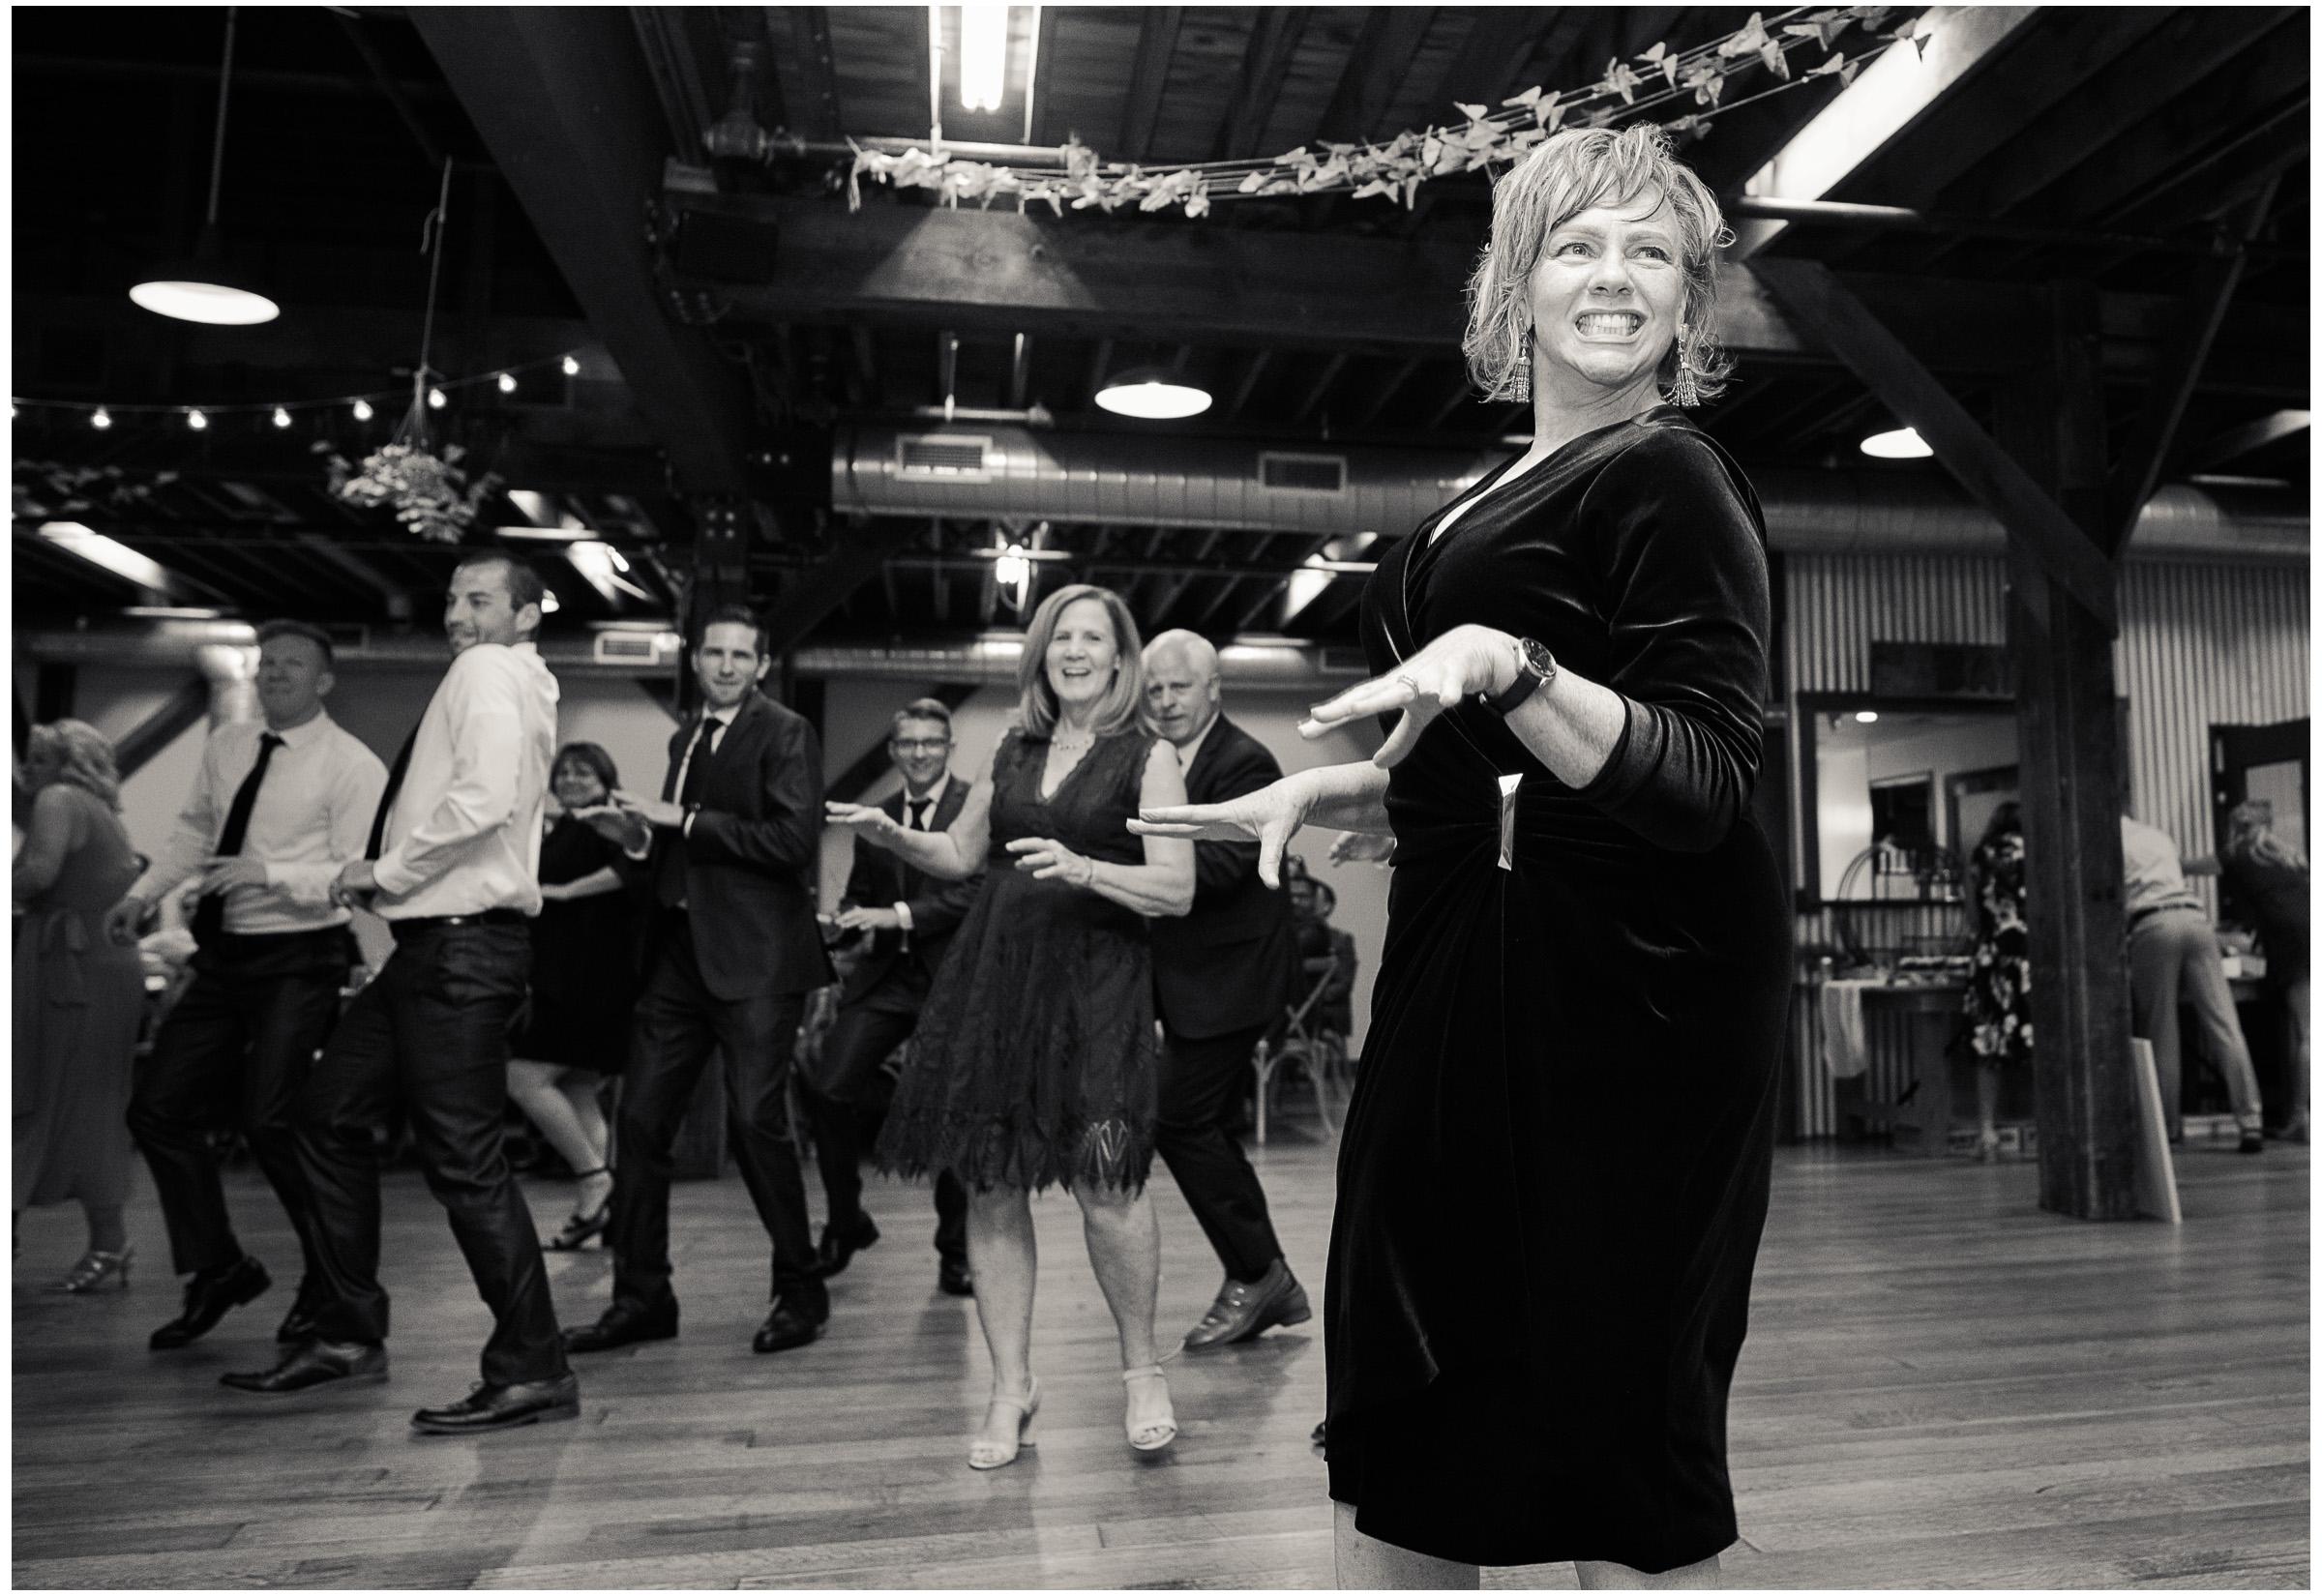 Loomis Wedding - Sacramento Photographer - Blue Goose - Justin Wilcox Photography - 18.jpg